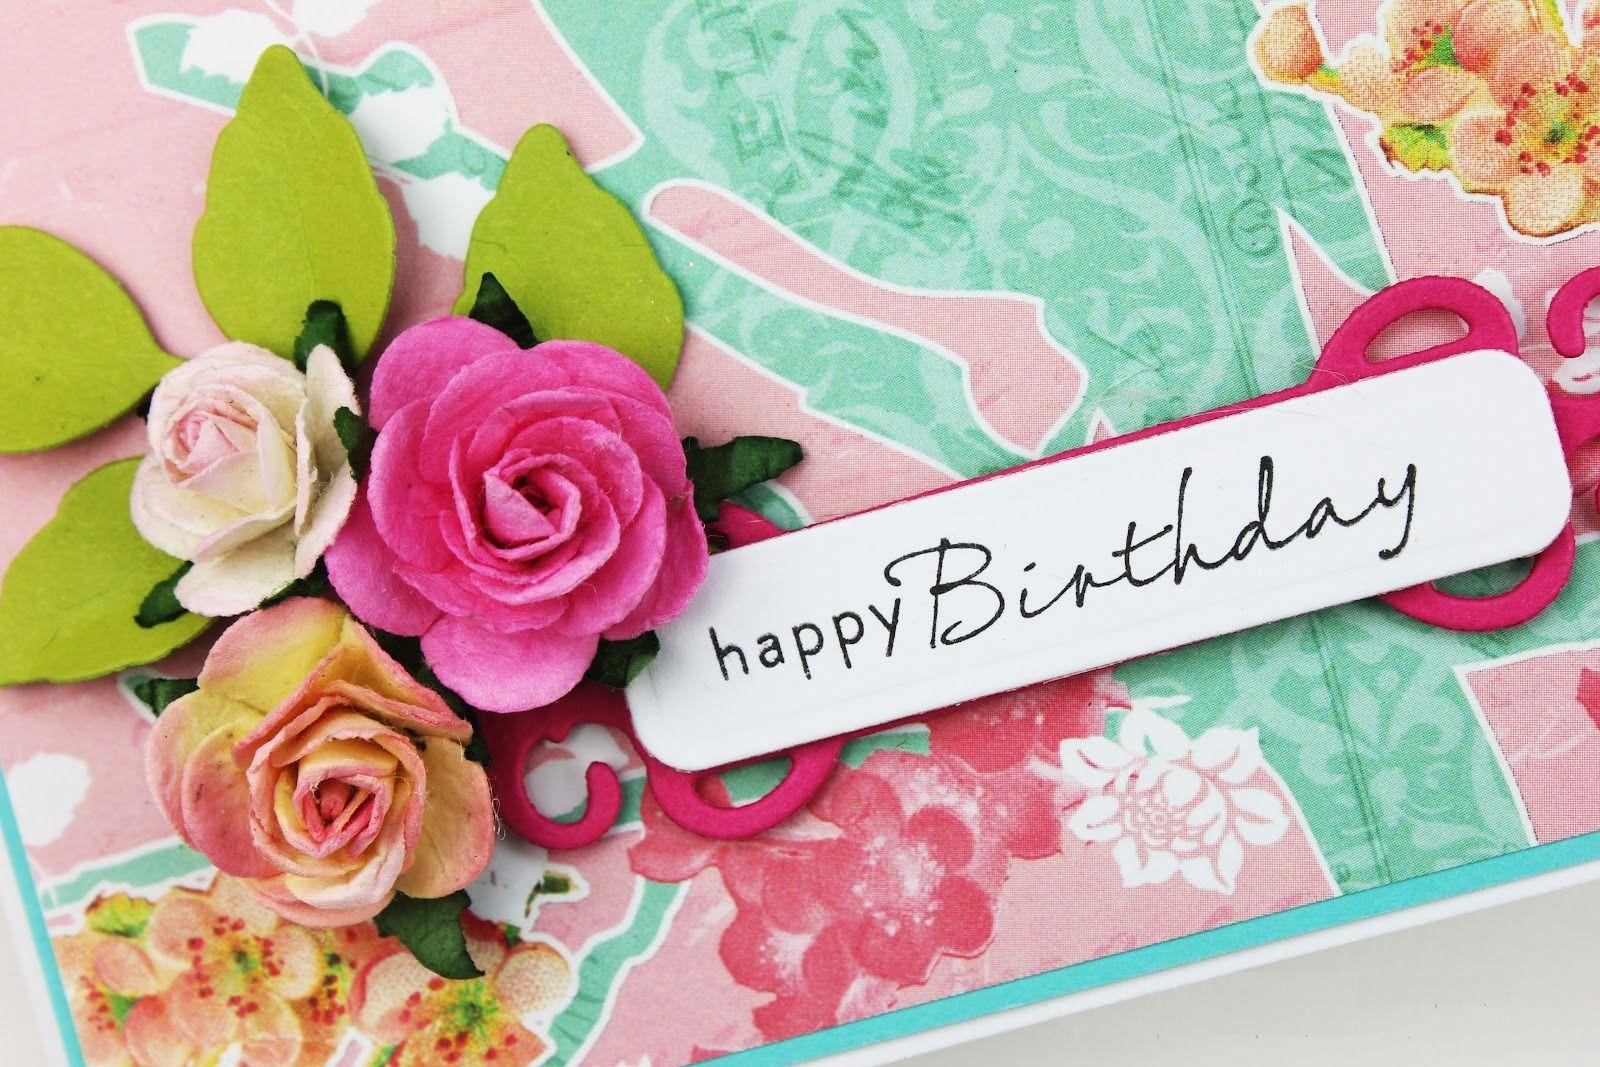 Free Happy Birthday Jpg ~ Flowers happy birthday images g jpeg image pixels